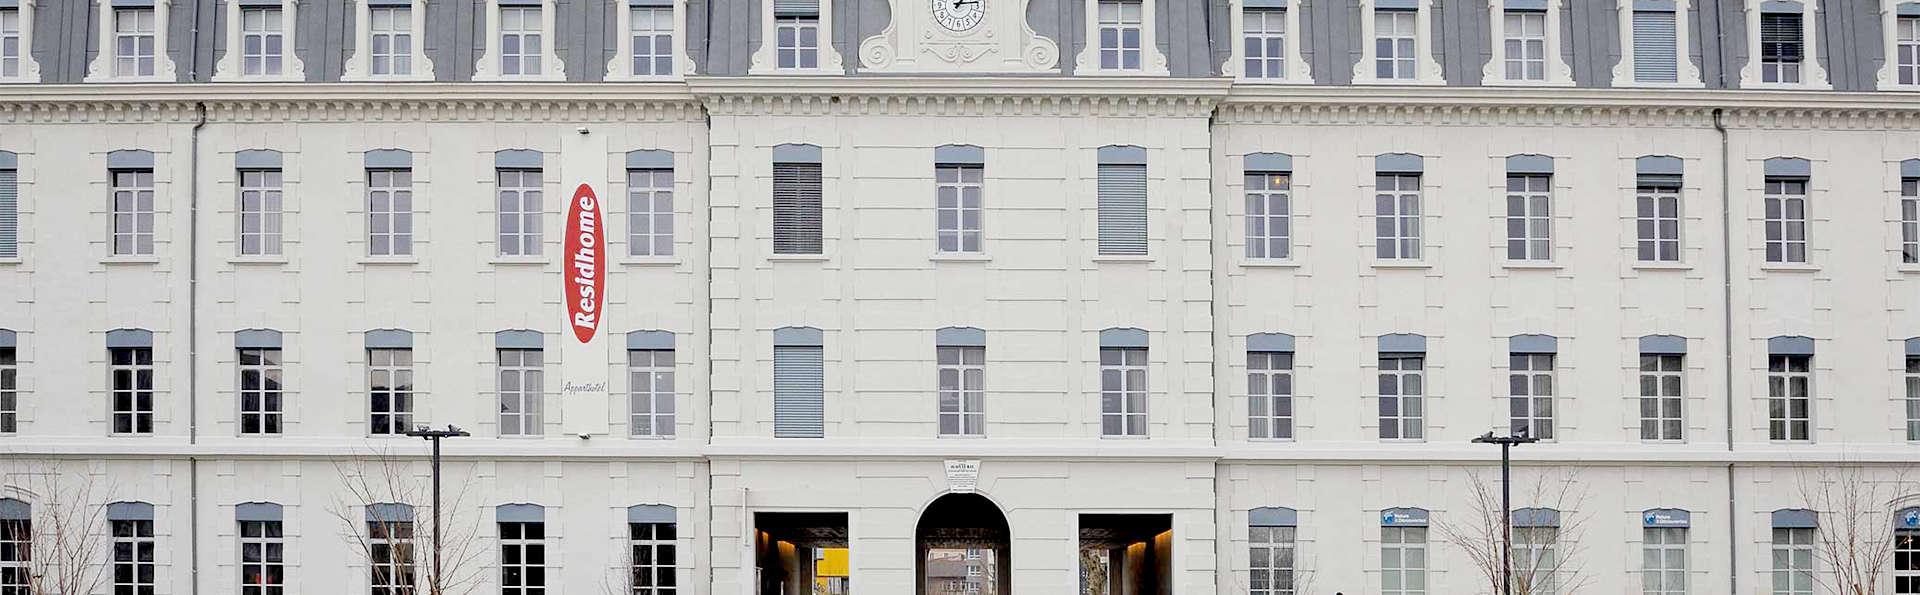 Residhome Caserne de Bonne - Edit_front2.jpg